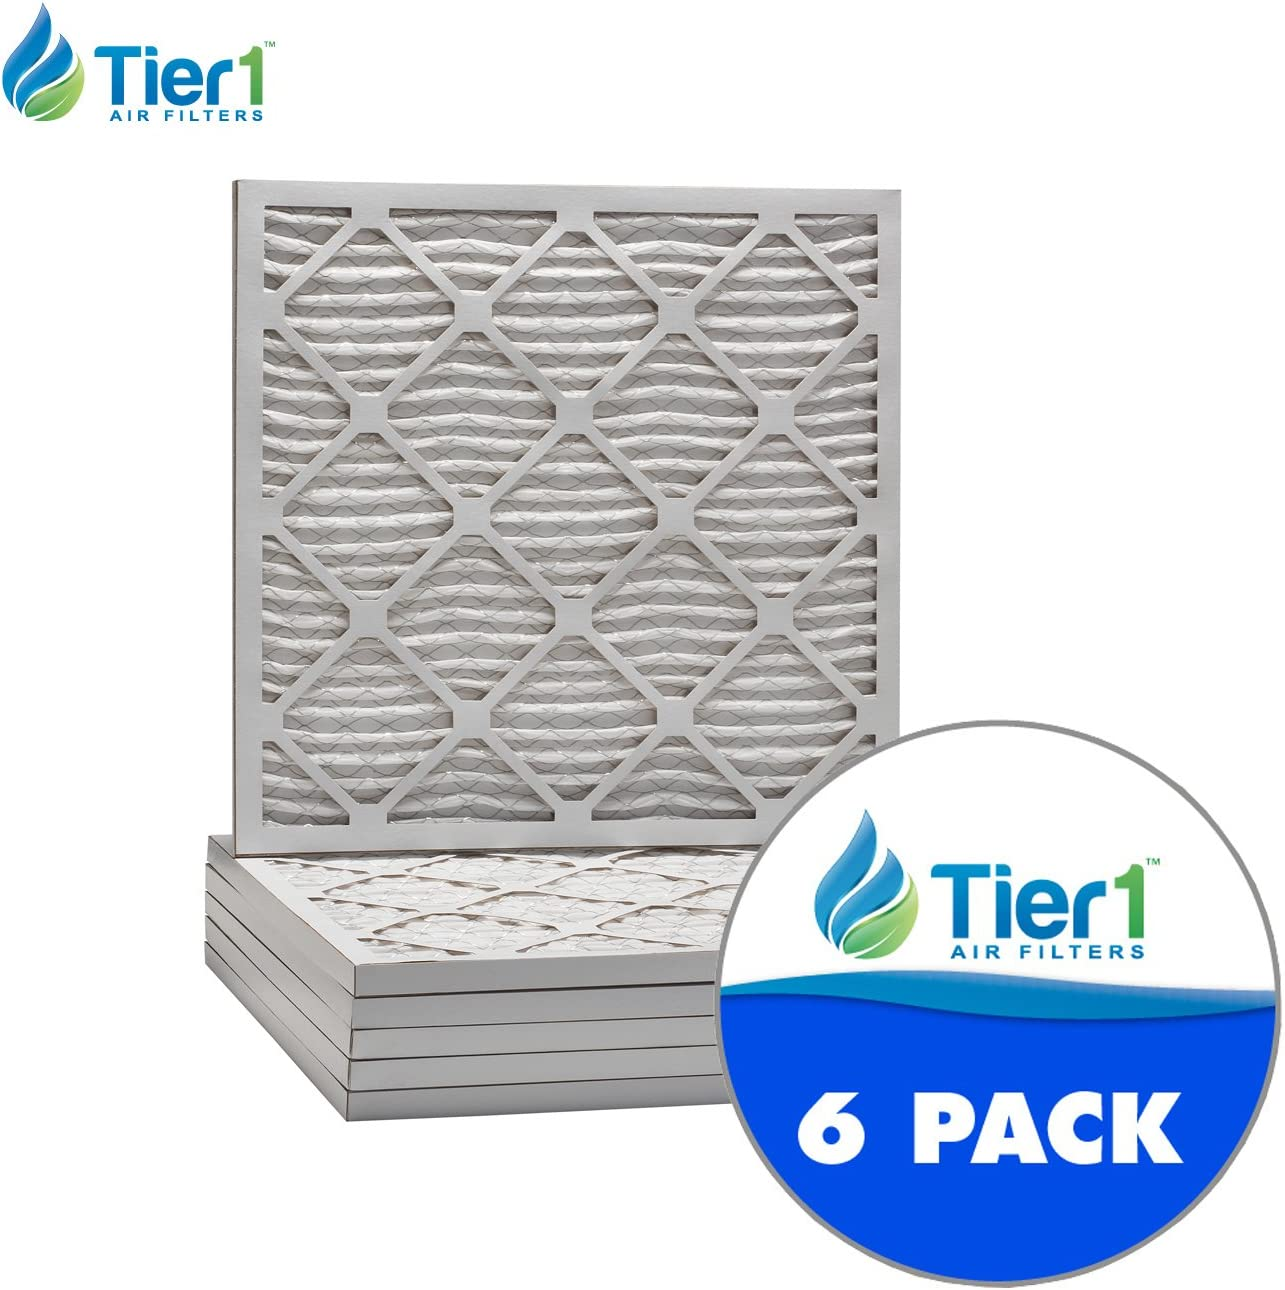 Tier1 21x21x1 Merv 8 Pleated Dust /& Pollen AC Furnace Air Filter 6 Pack